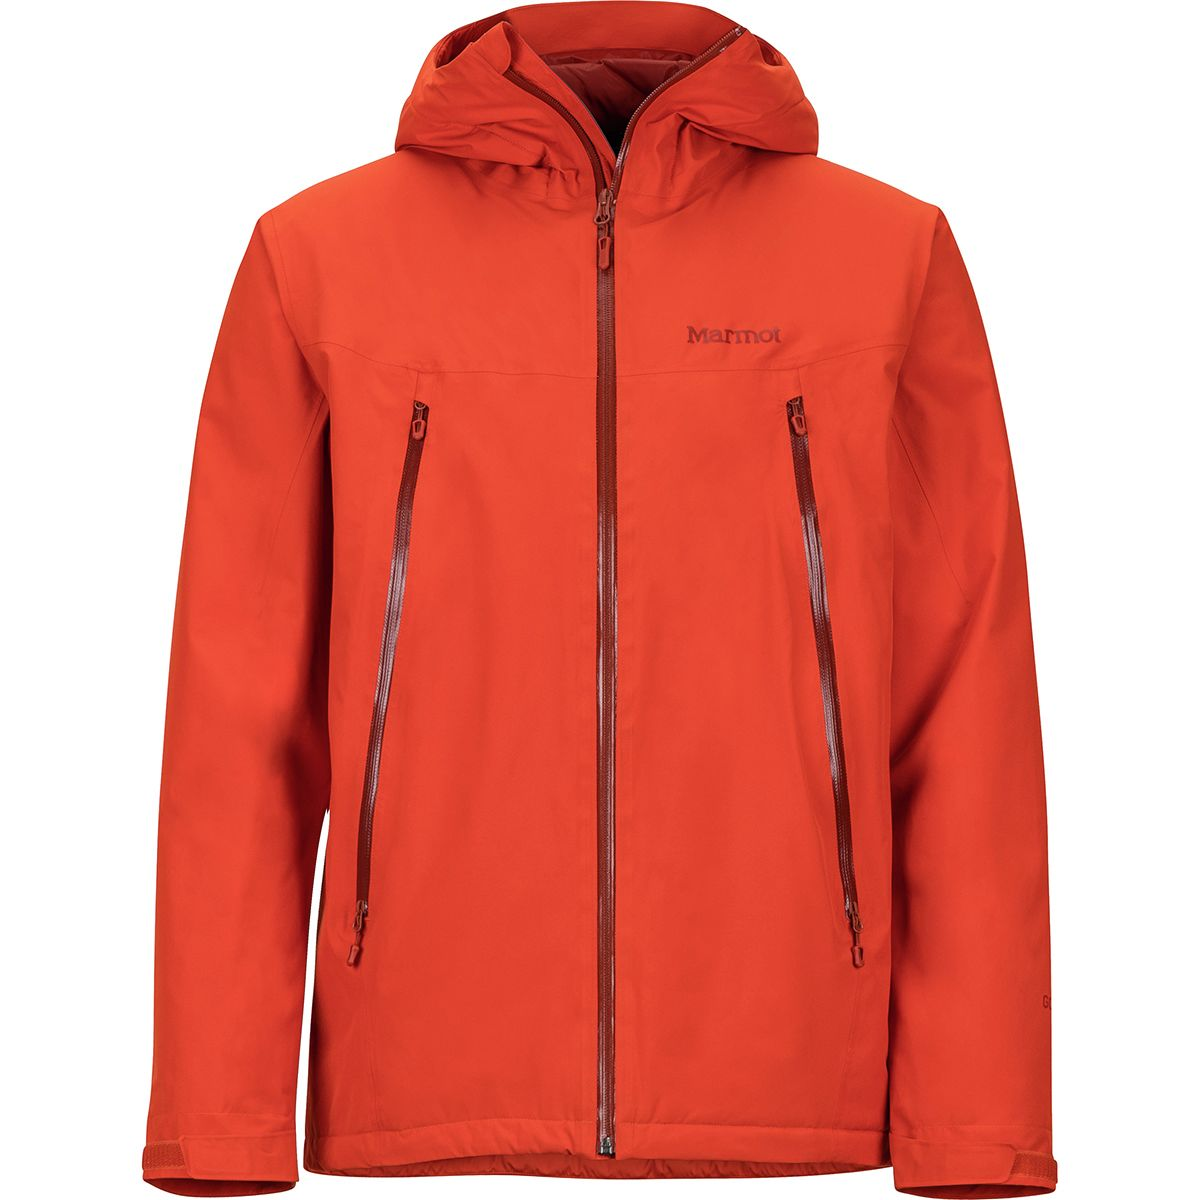 Marmot Solaris Jacket